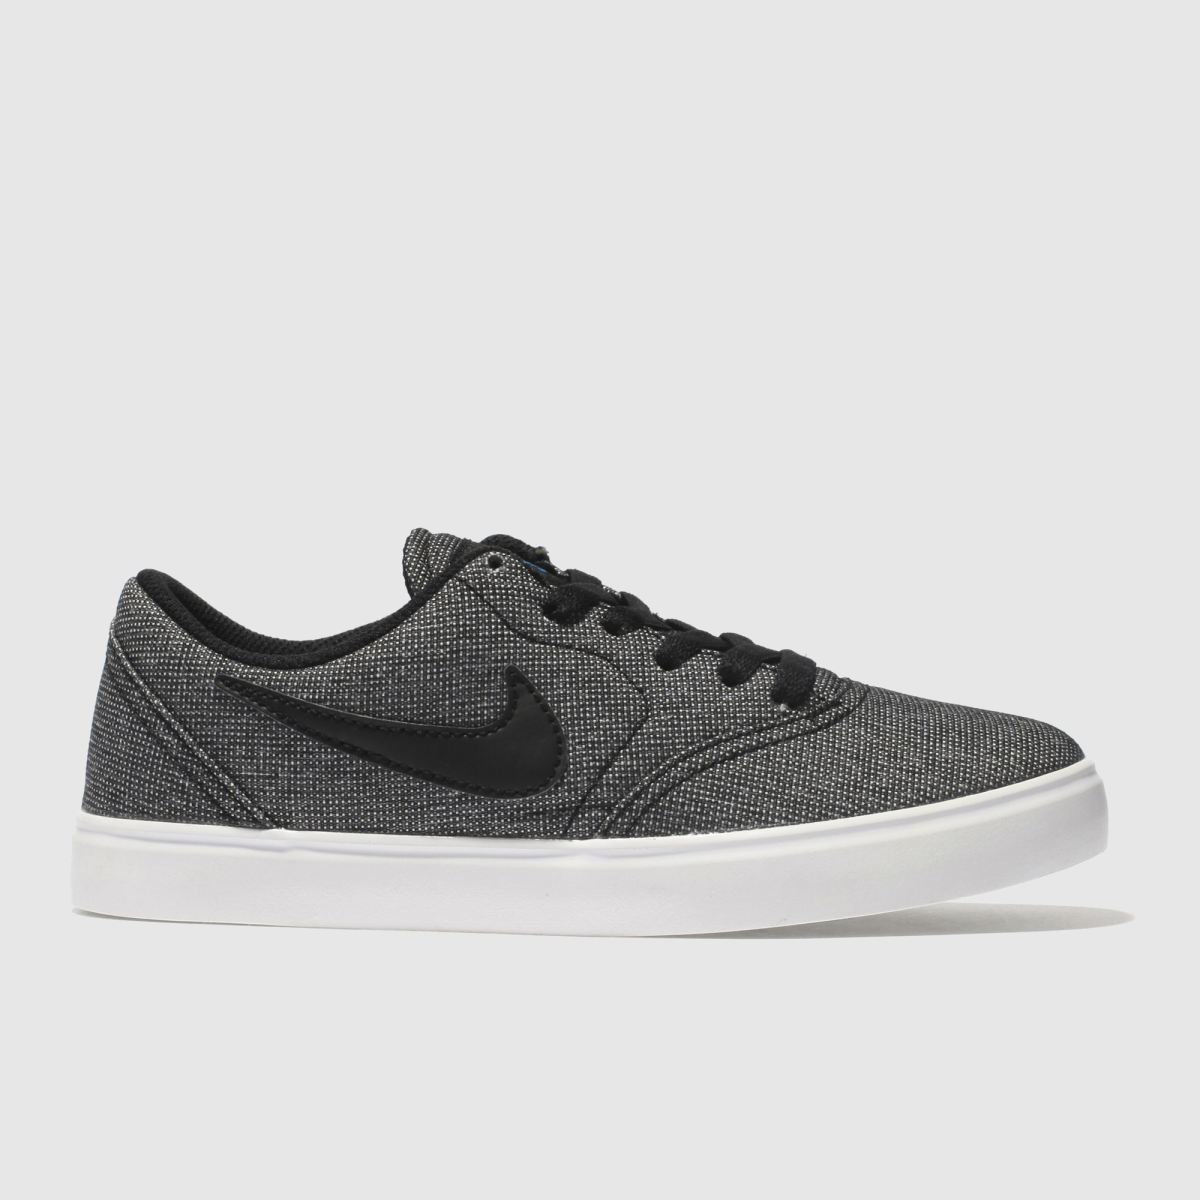 Nike SB Nike Sb Black & Grey Check Youth Trainers